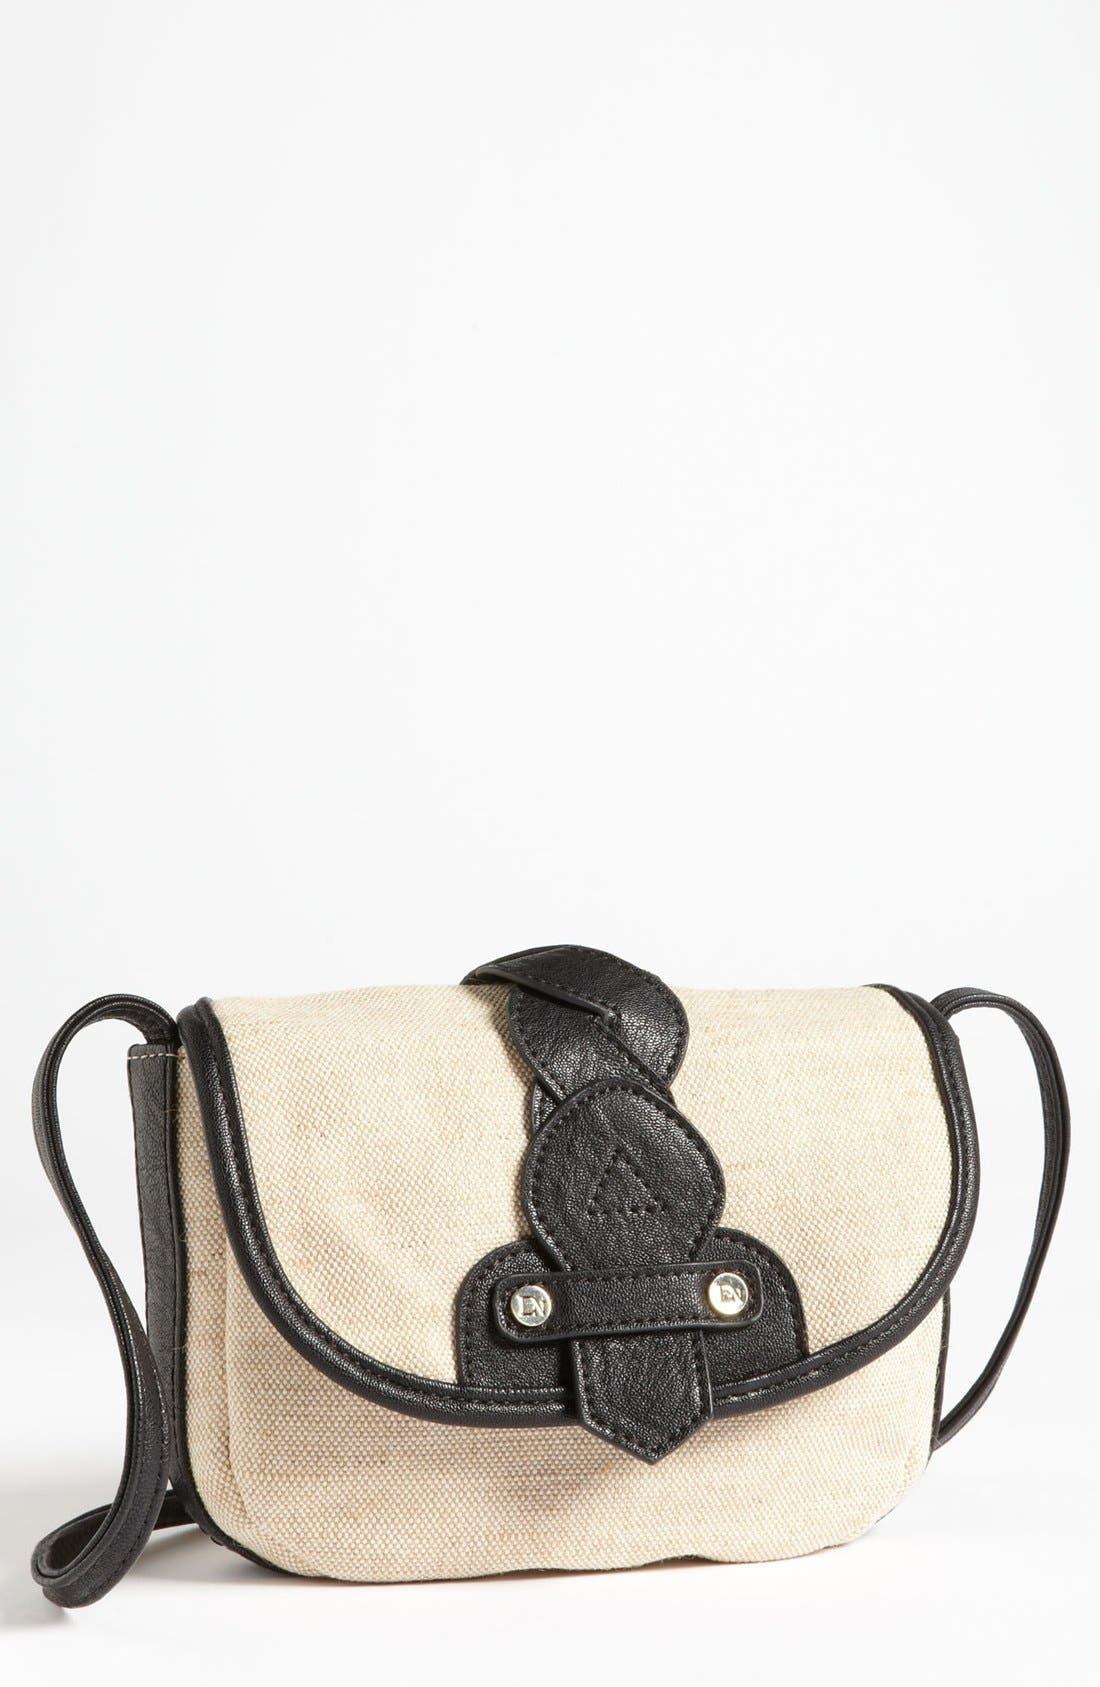 Main Image - Danielle Nicole 'Nola' Canvas Crossbody Bag